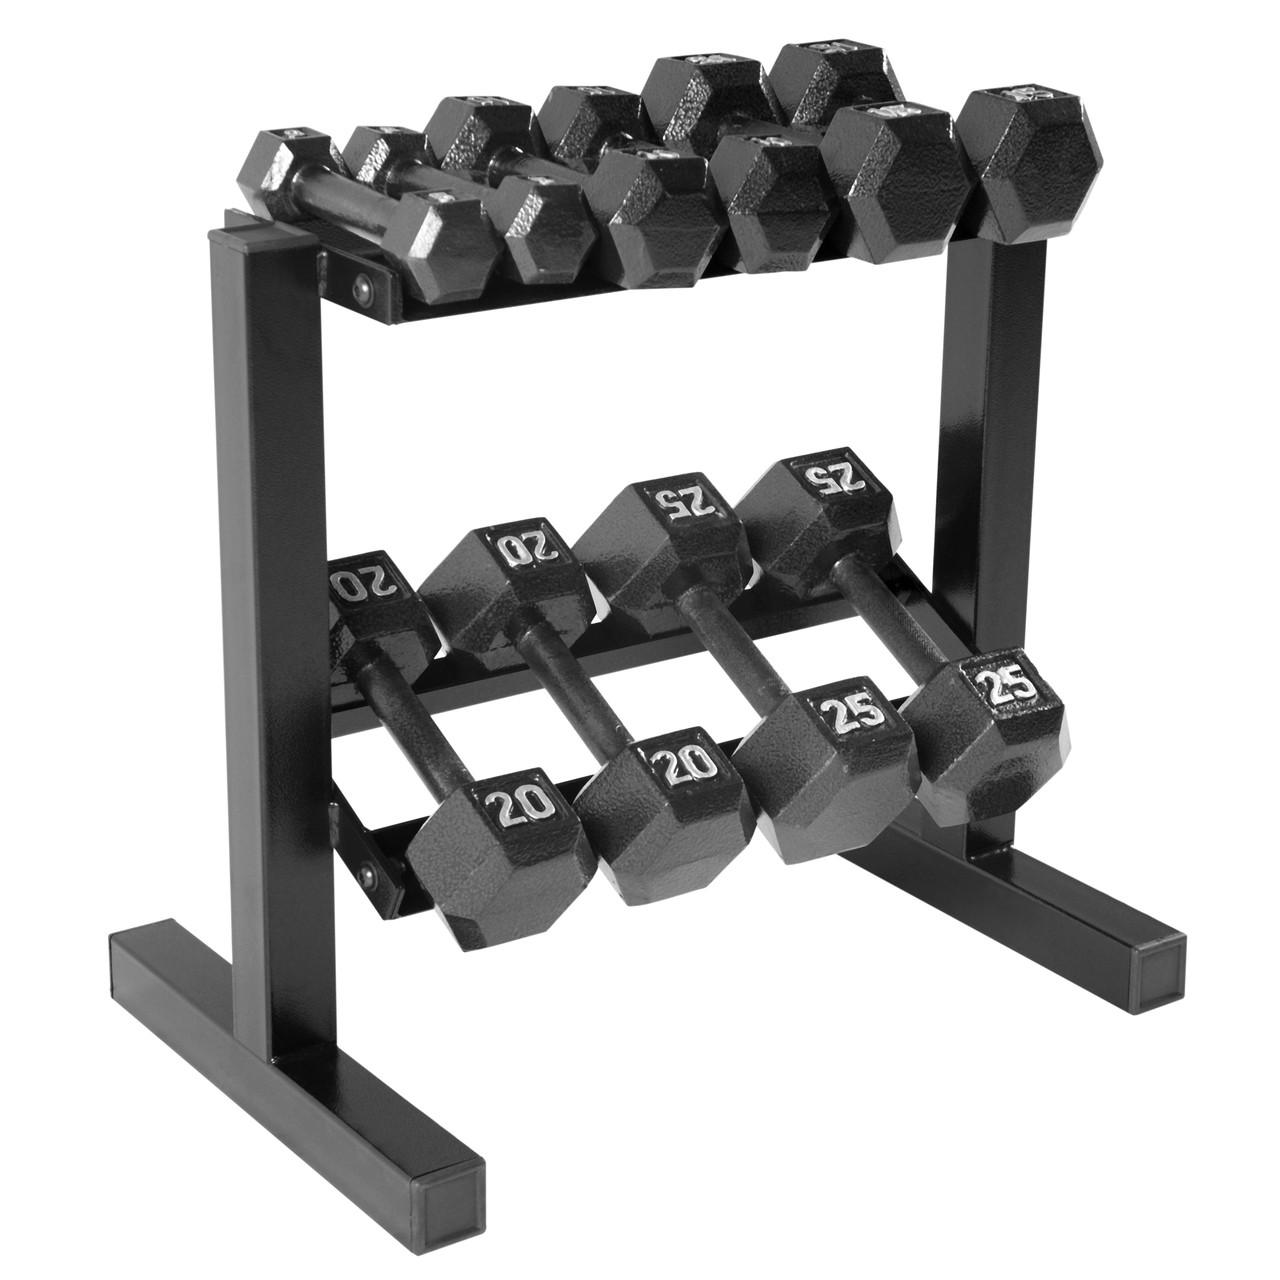 cap black cast iron hex dumbbell set with rack 150 lb